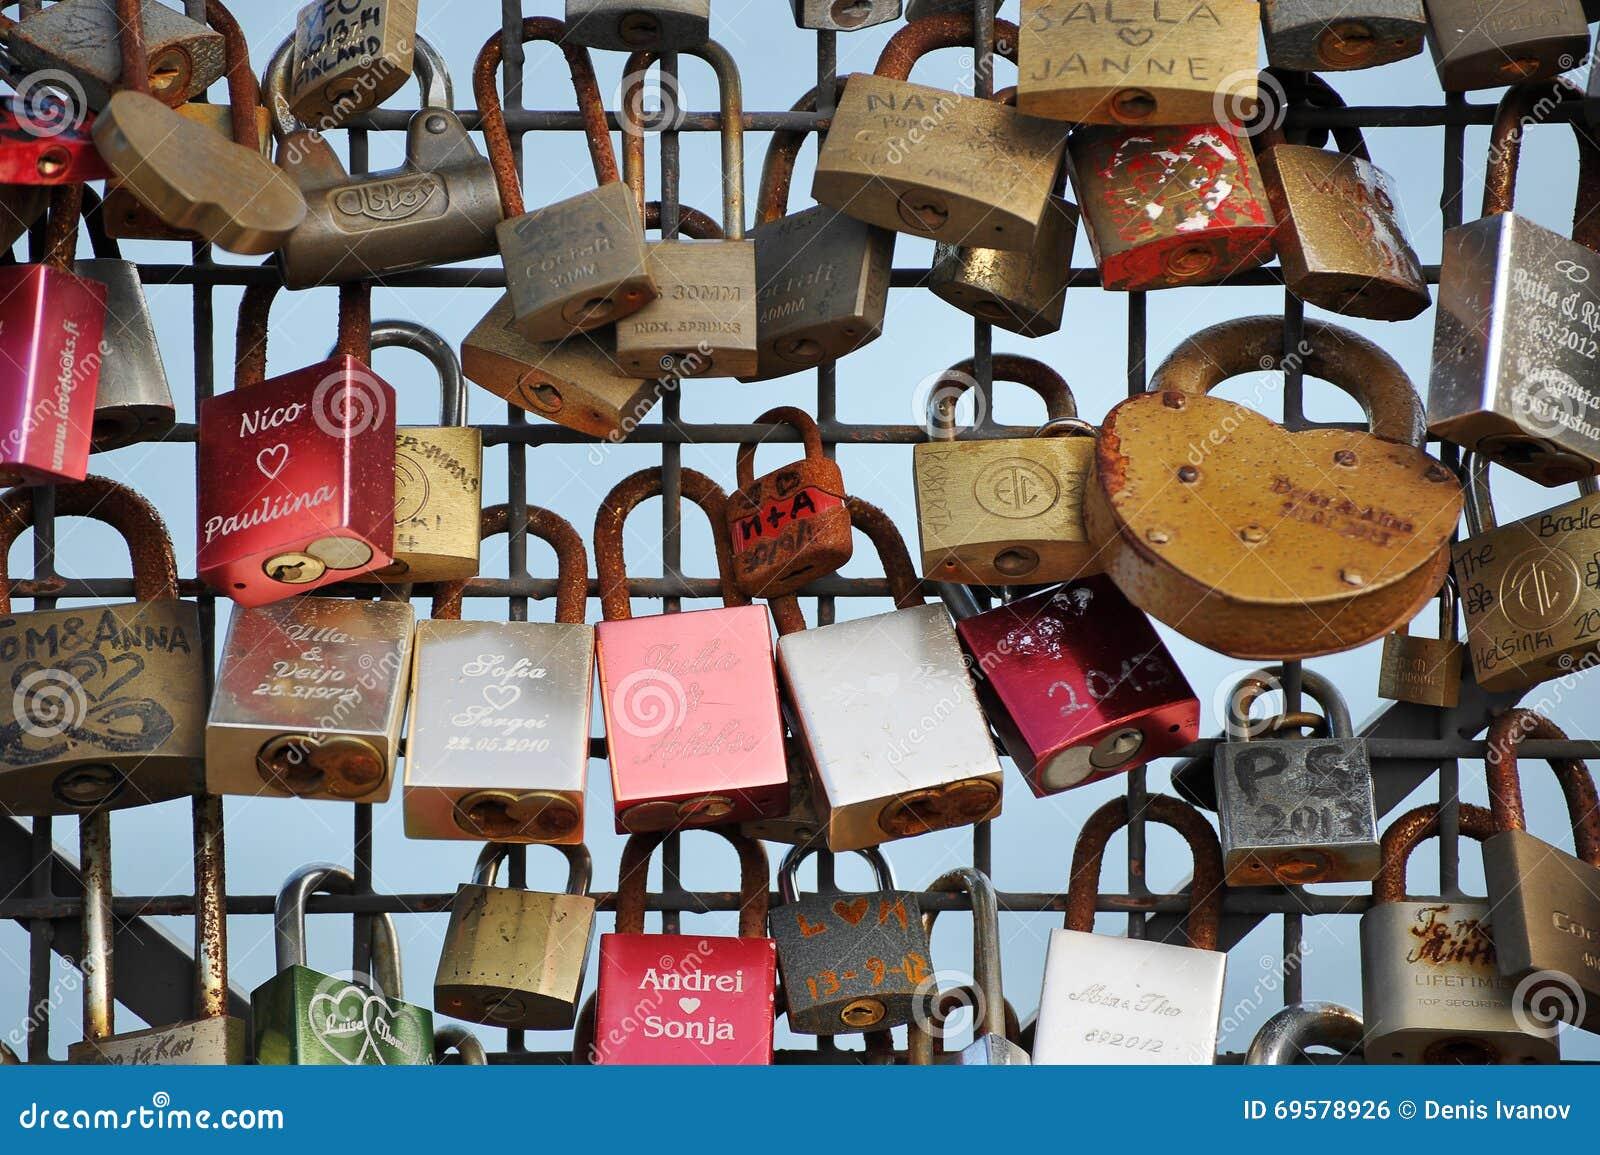 bridgelove dating site